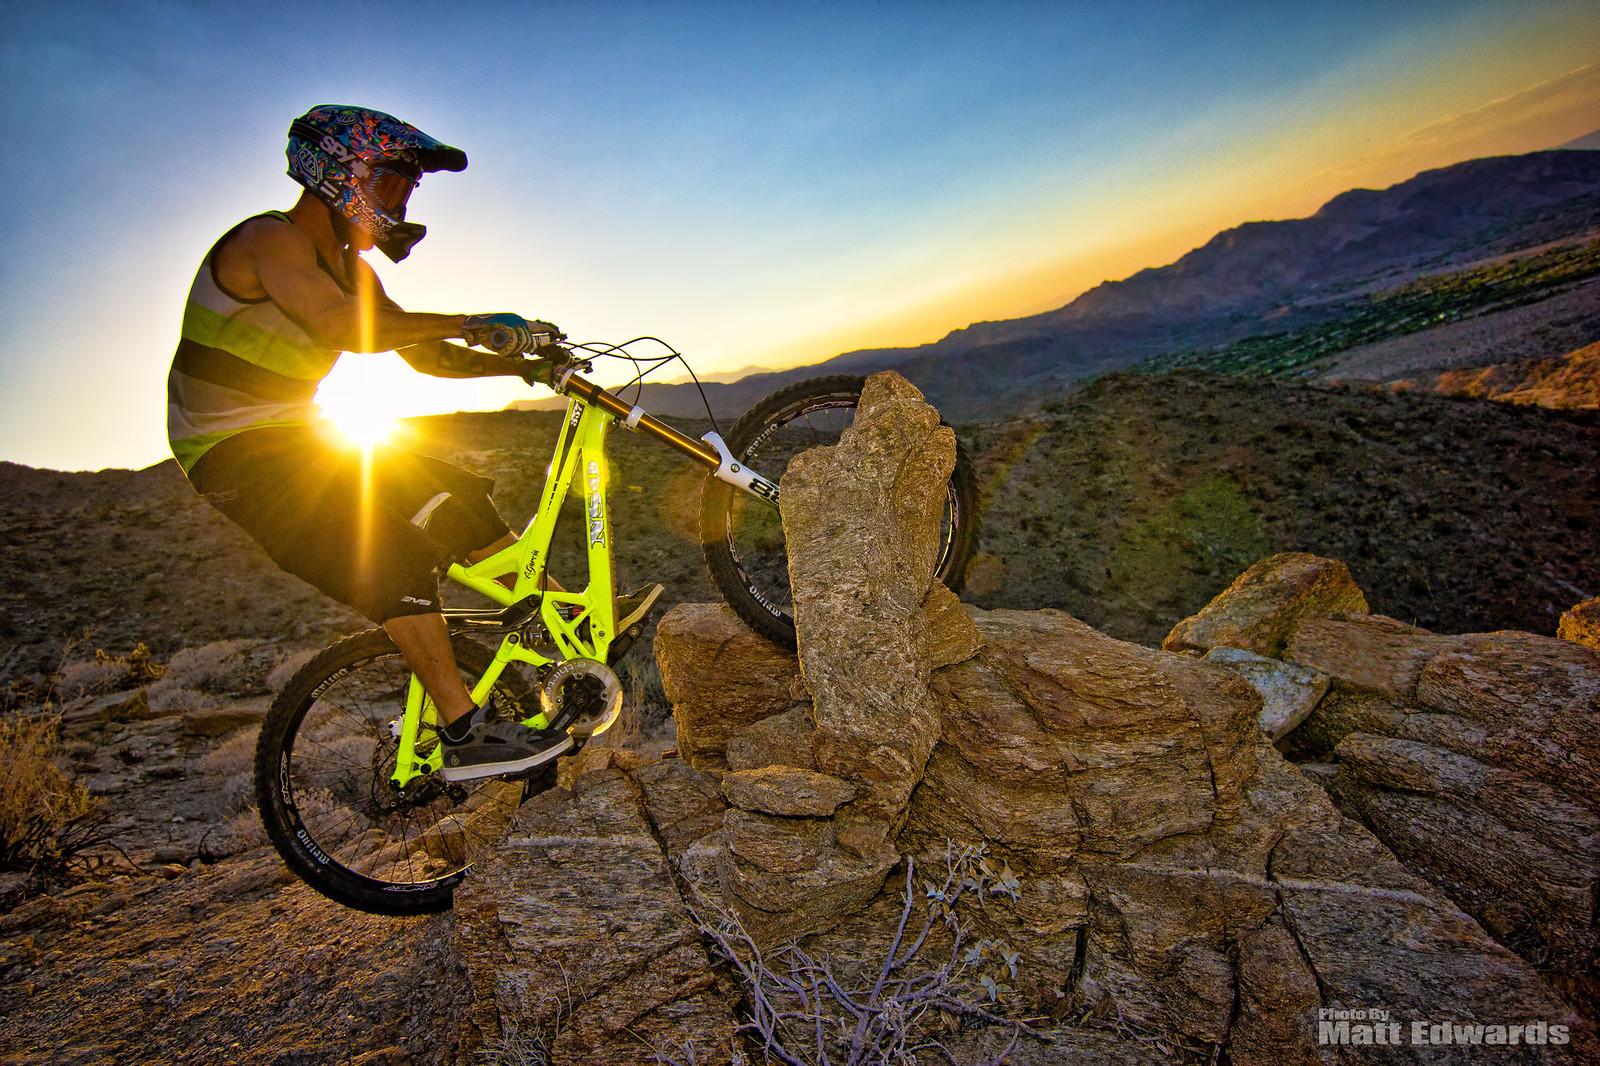 Alvino in the rock garden - EdwardsEntertainment - Mountain Biking Pictures - Vital MTB